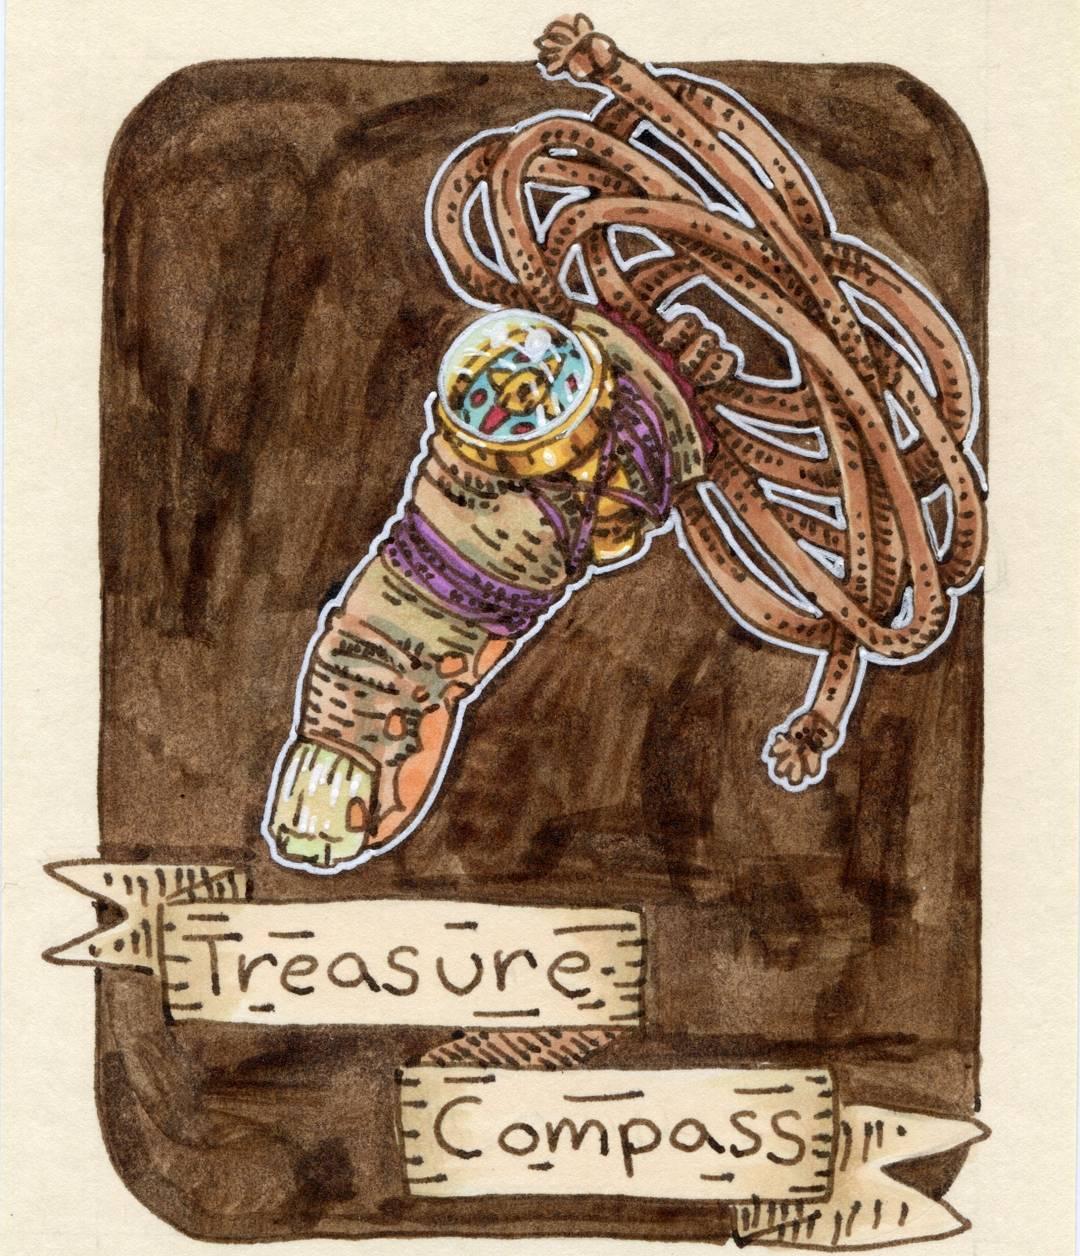 "redjarojam ""Treasure Compass"" - by Jared DeCosta (redjarojam) www.instagram.com/redjarojam (2018-02) © dell'autore tutti i diritti riservati"